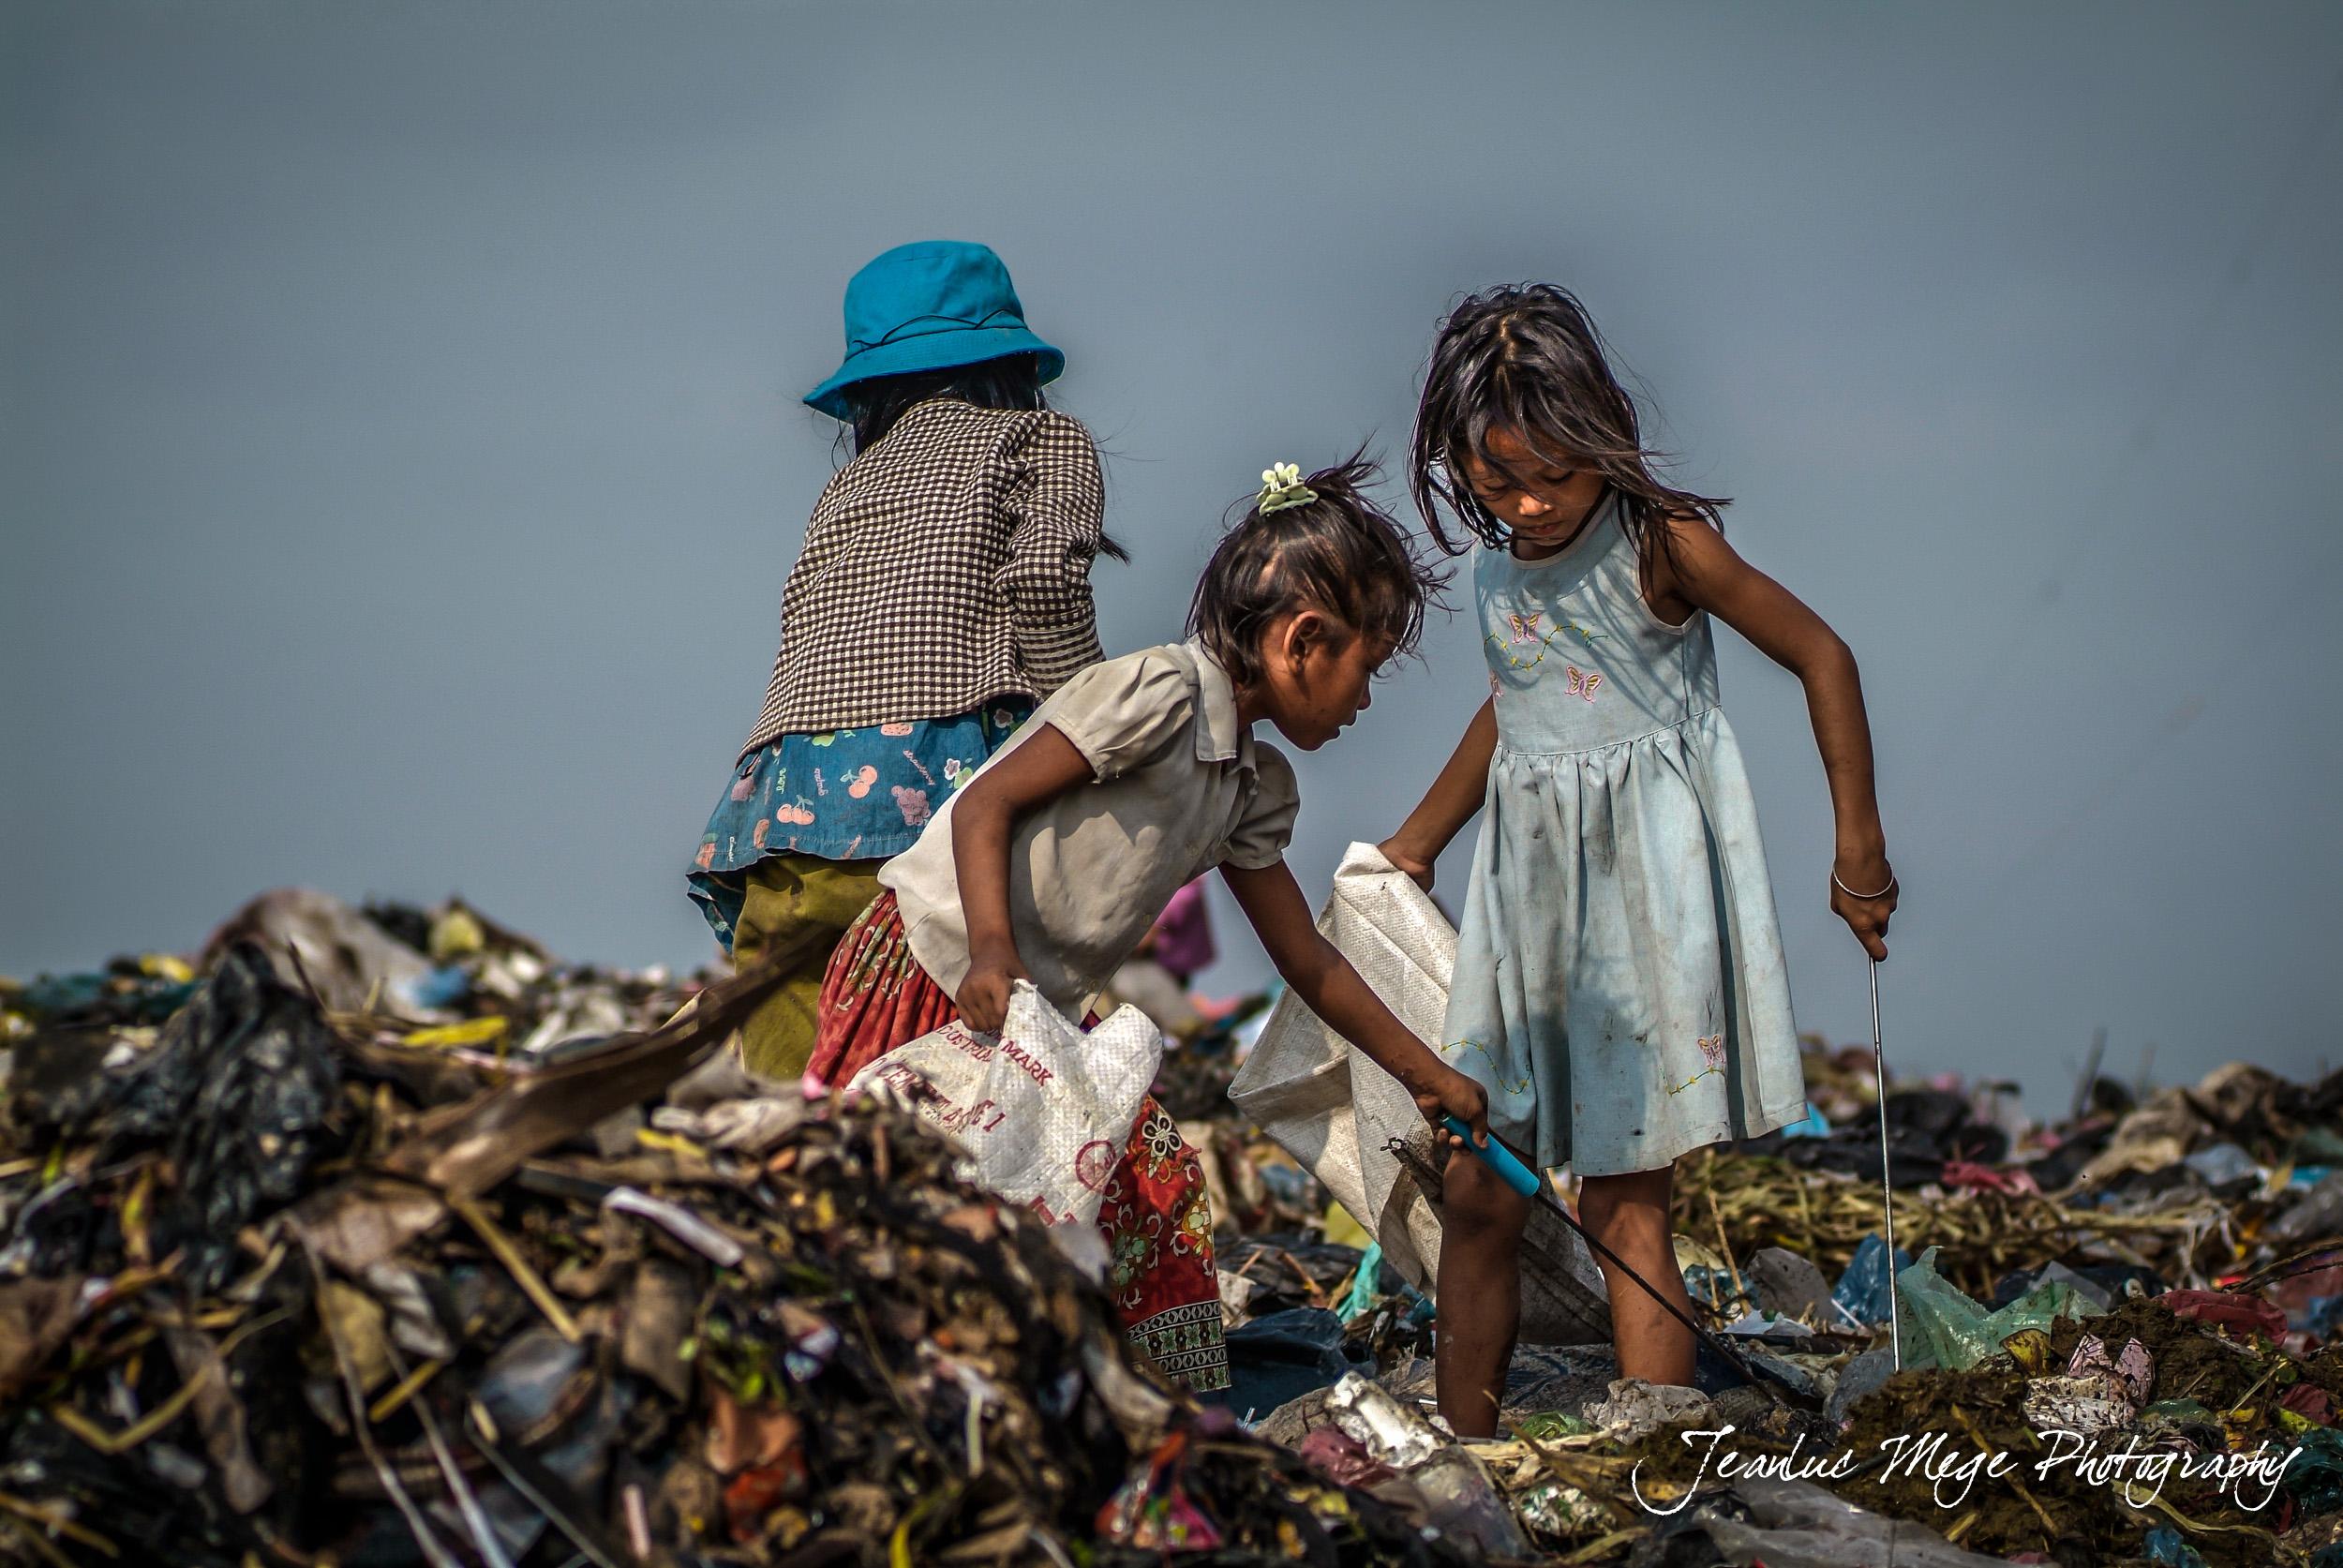 Jean Luc Mege Cambodia-8714.jpg